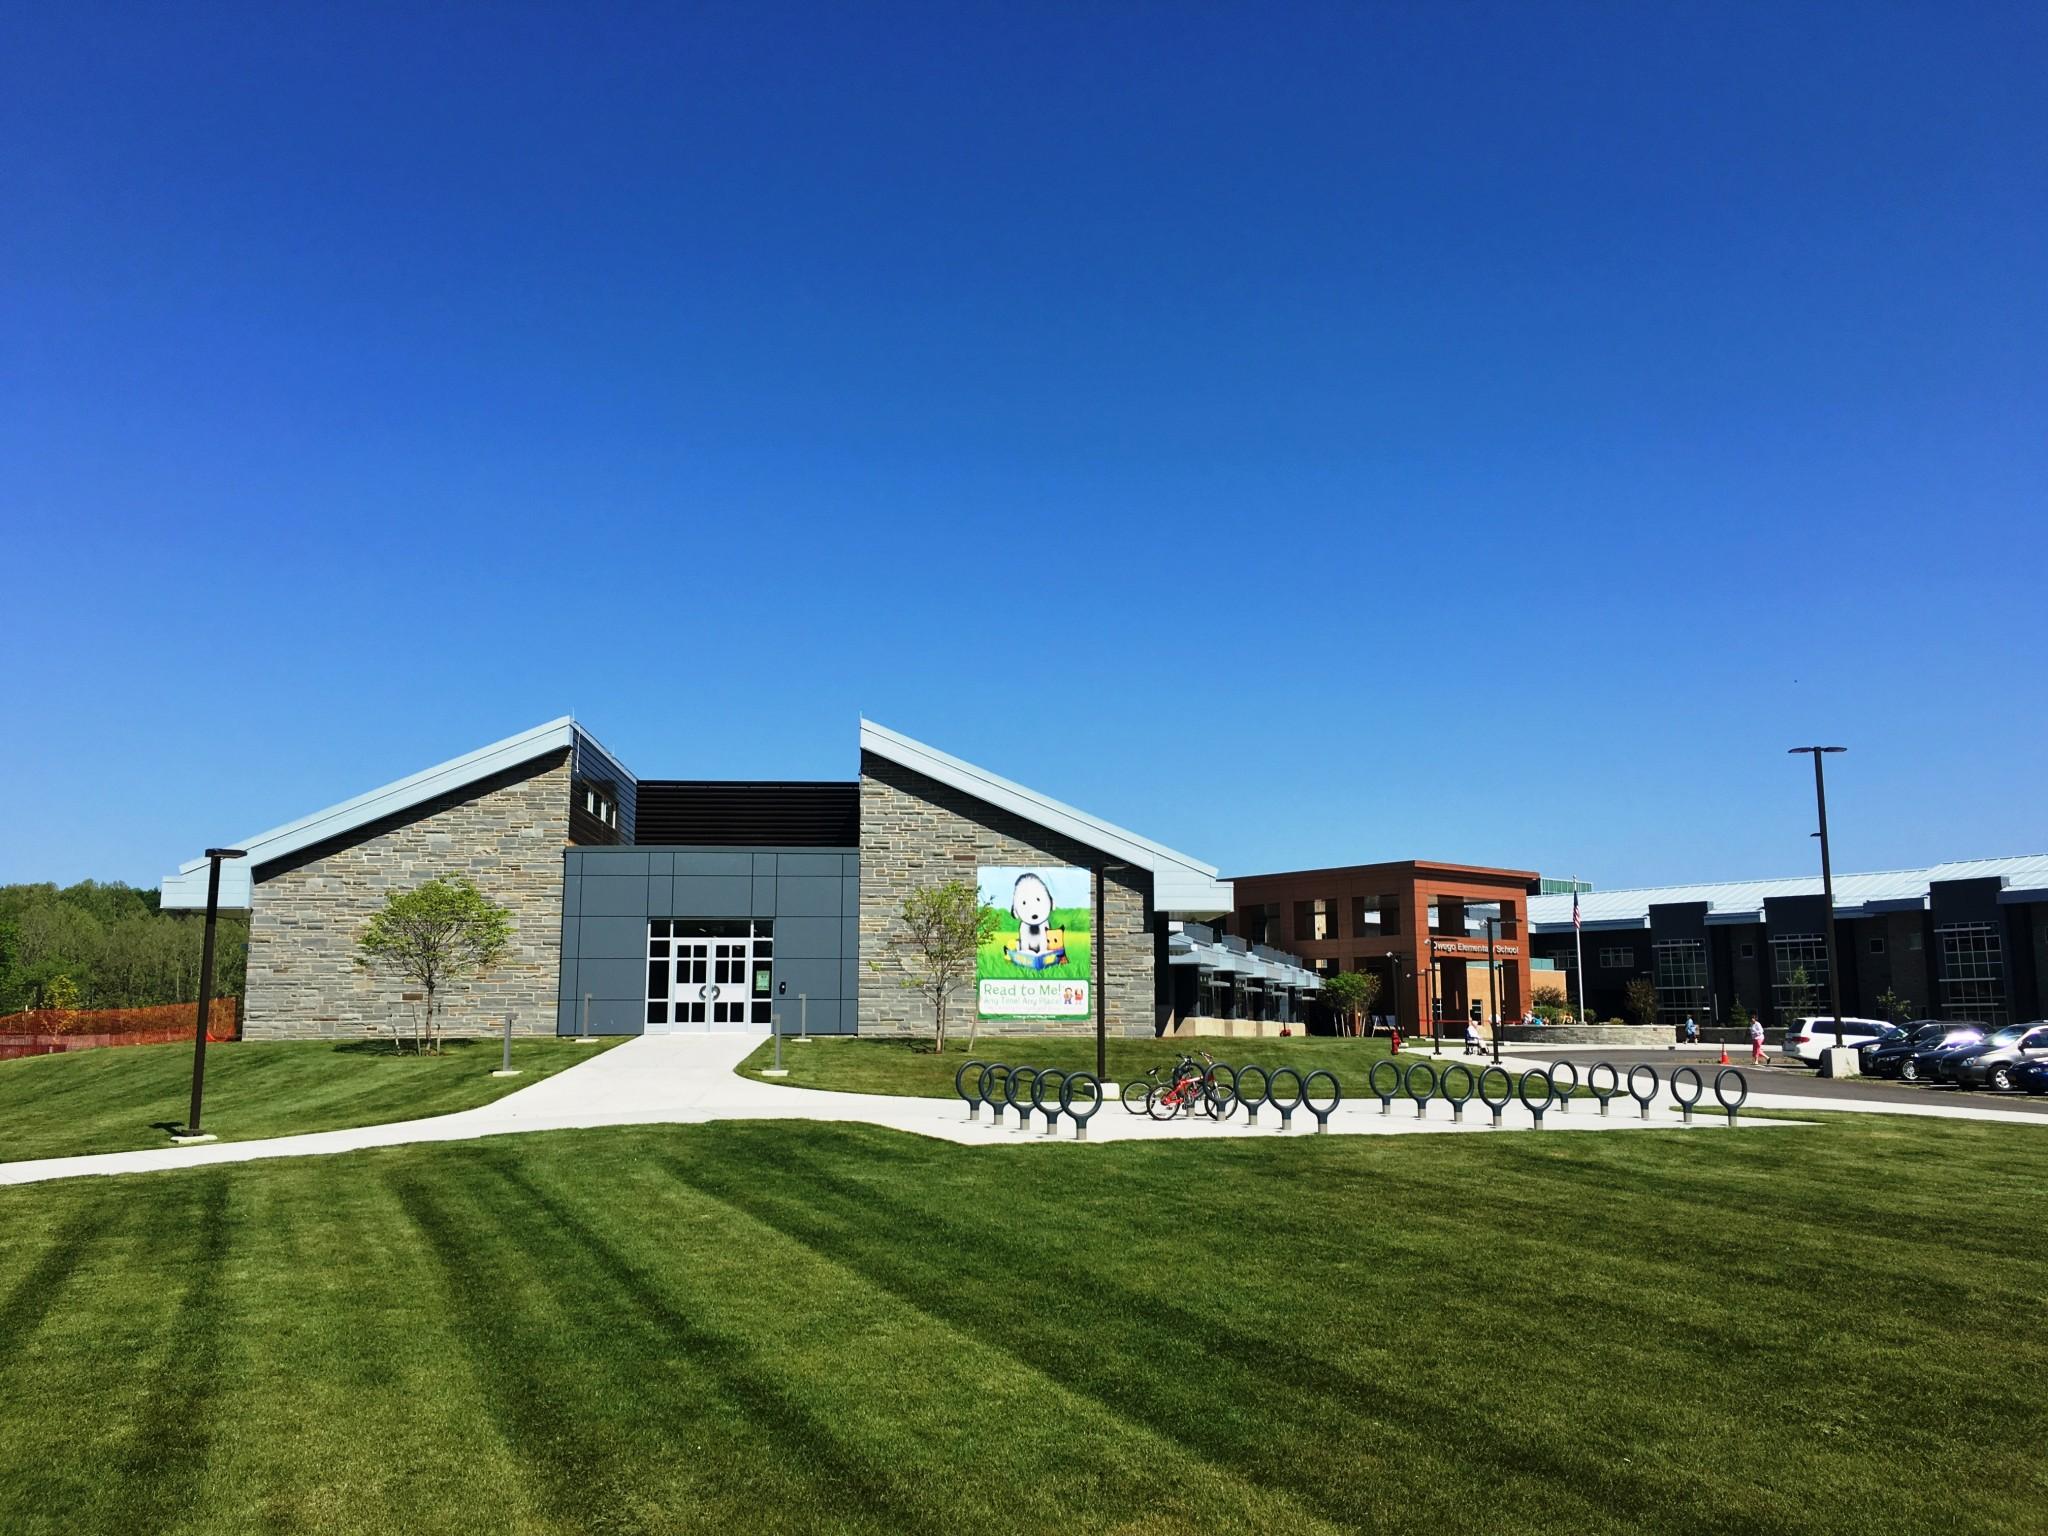 Owego Elementary School Evans Roofing Company Inc Evans